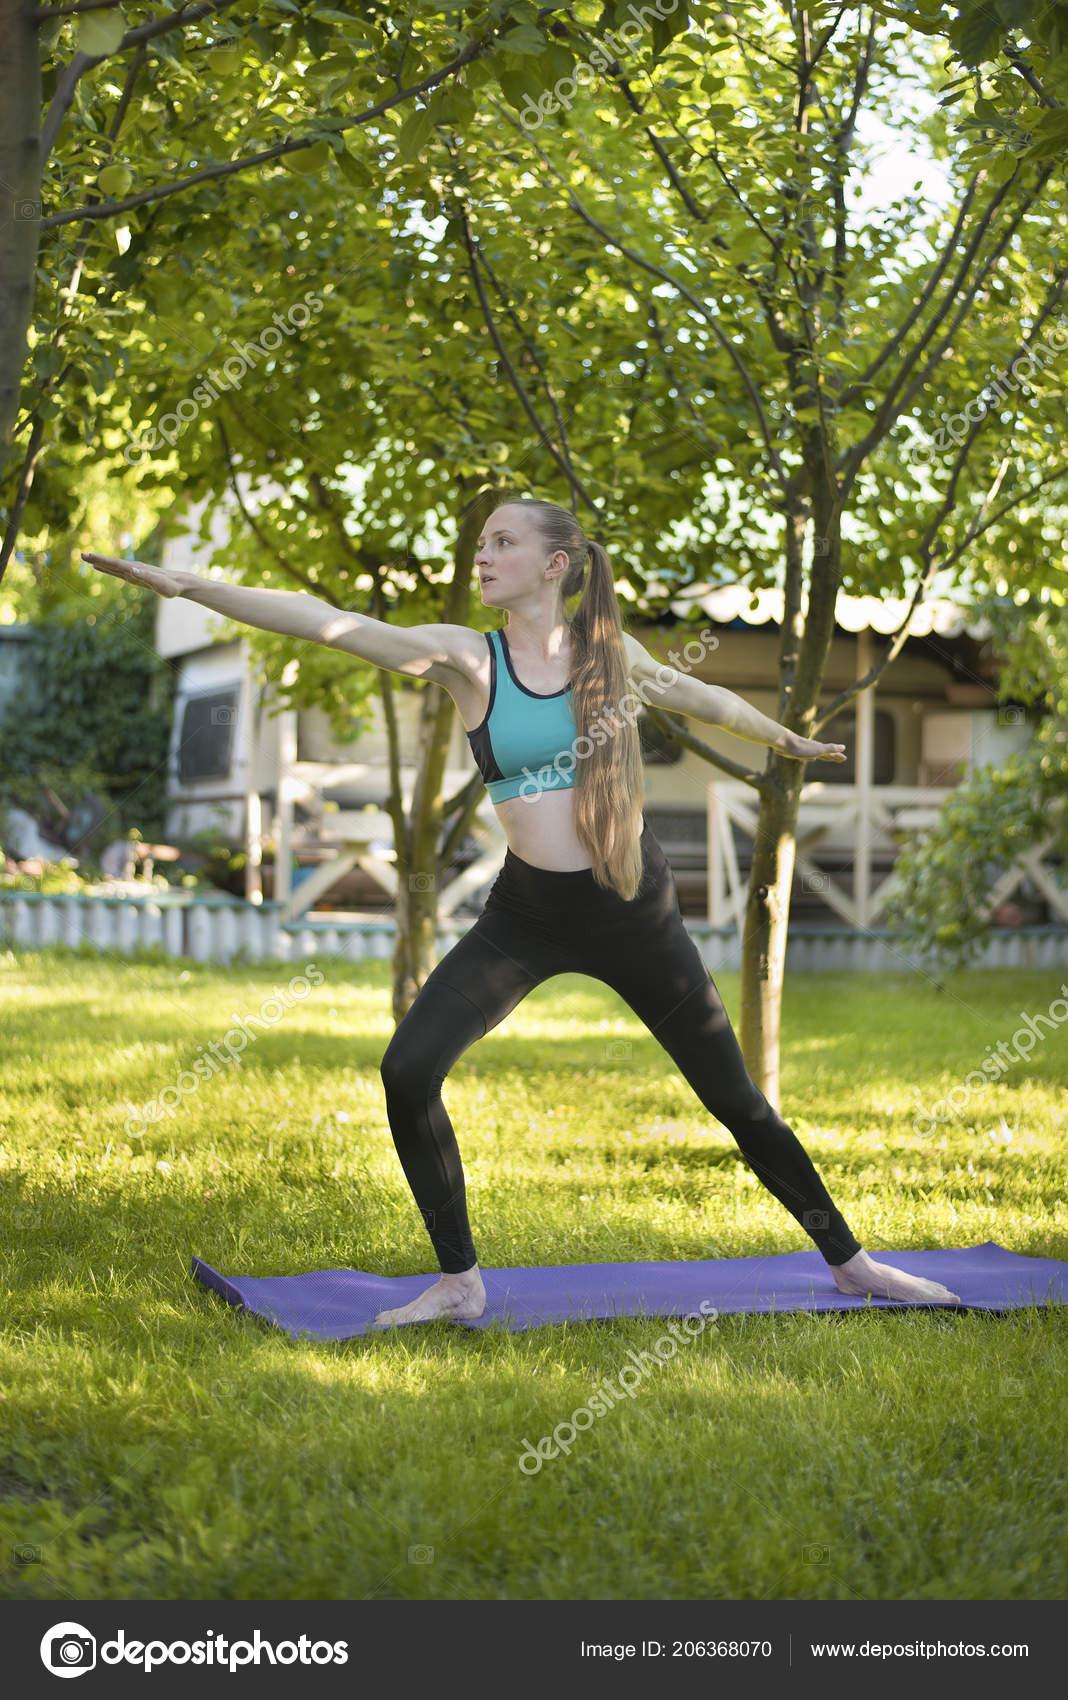 schwangere frau garten praktiziert yoga krieger pose. Black Bedroom Furniture Sets. Home Design Ideas